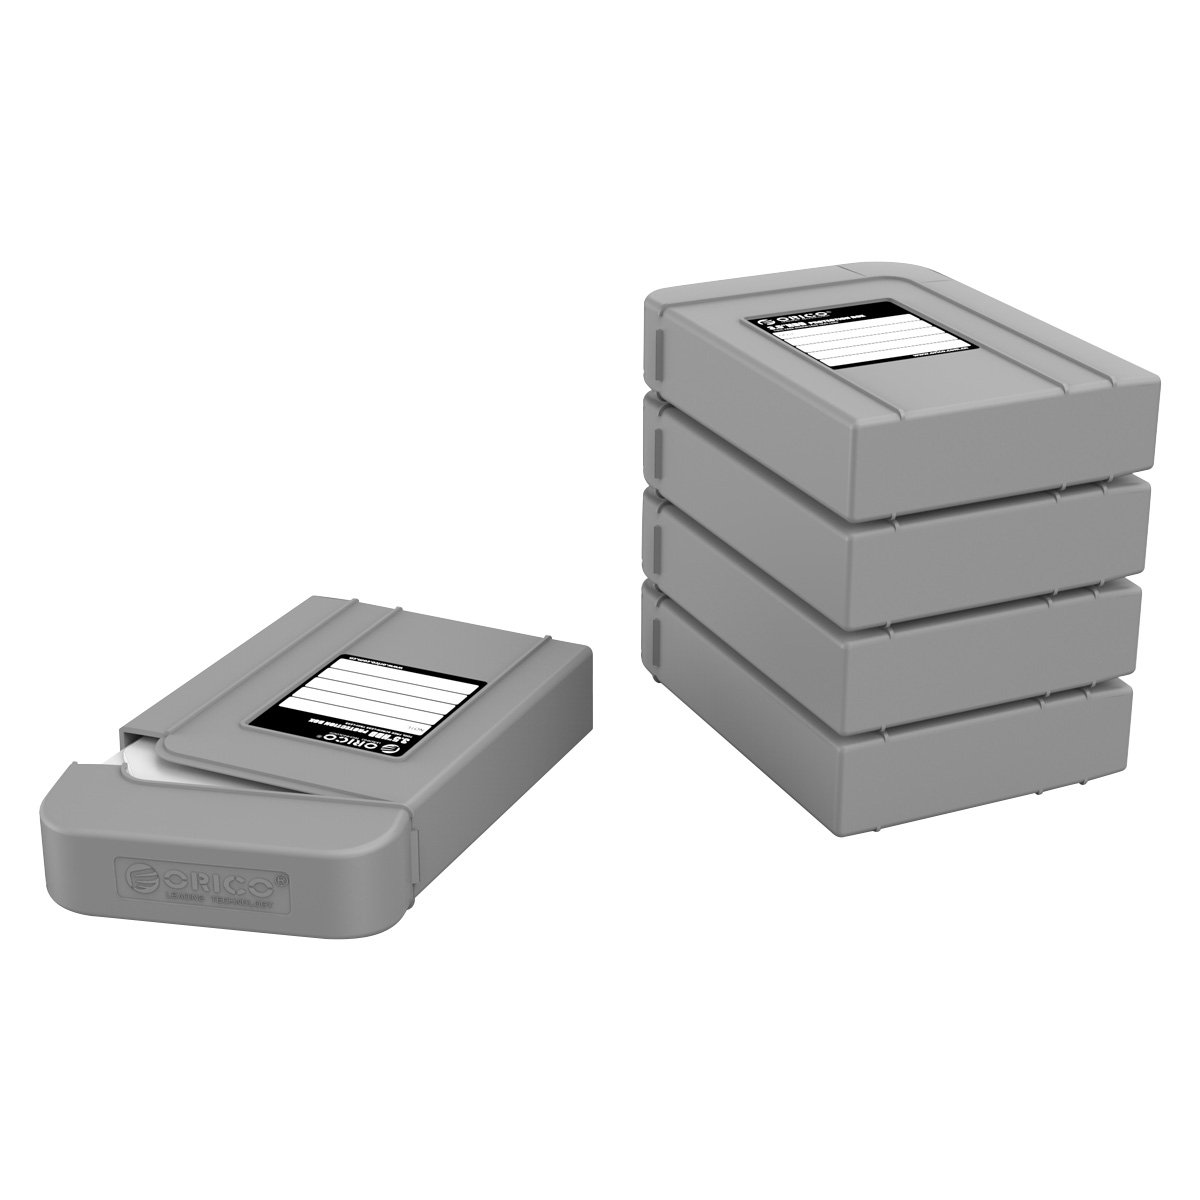 ORICO 3.5'' Hard Drive Case Protective Box Storage Case Organizational Box 5 Pack- Grey